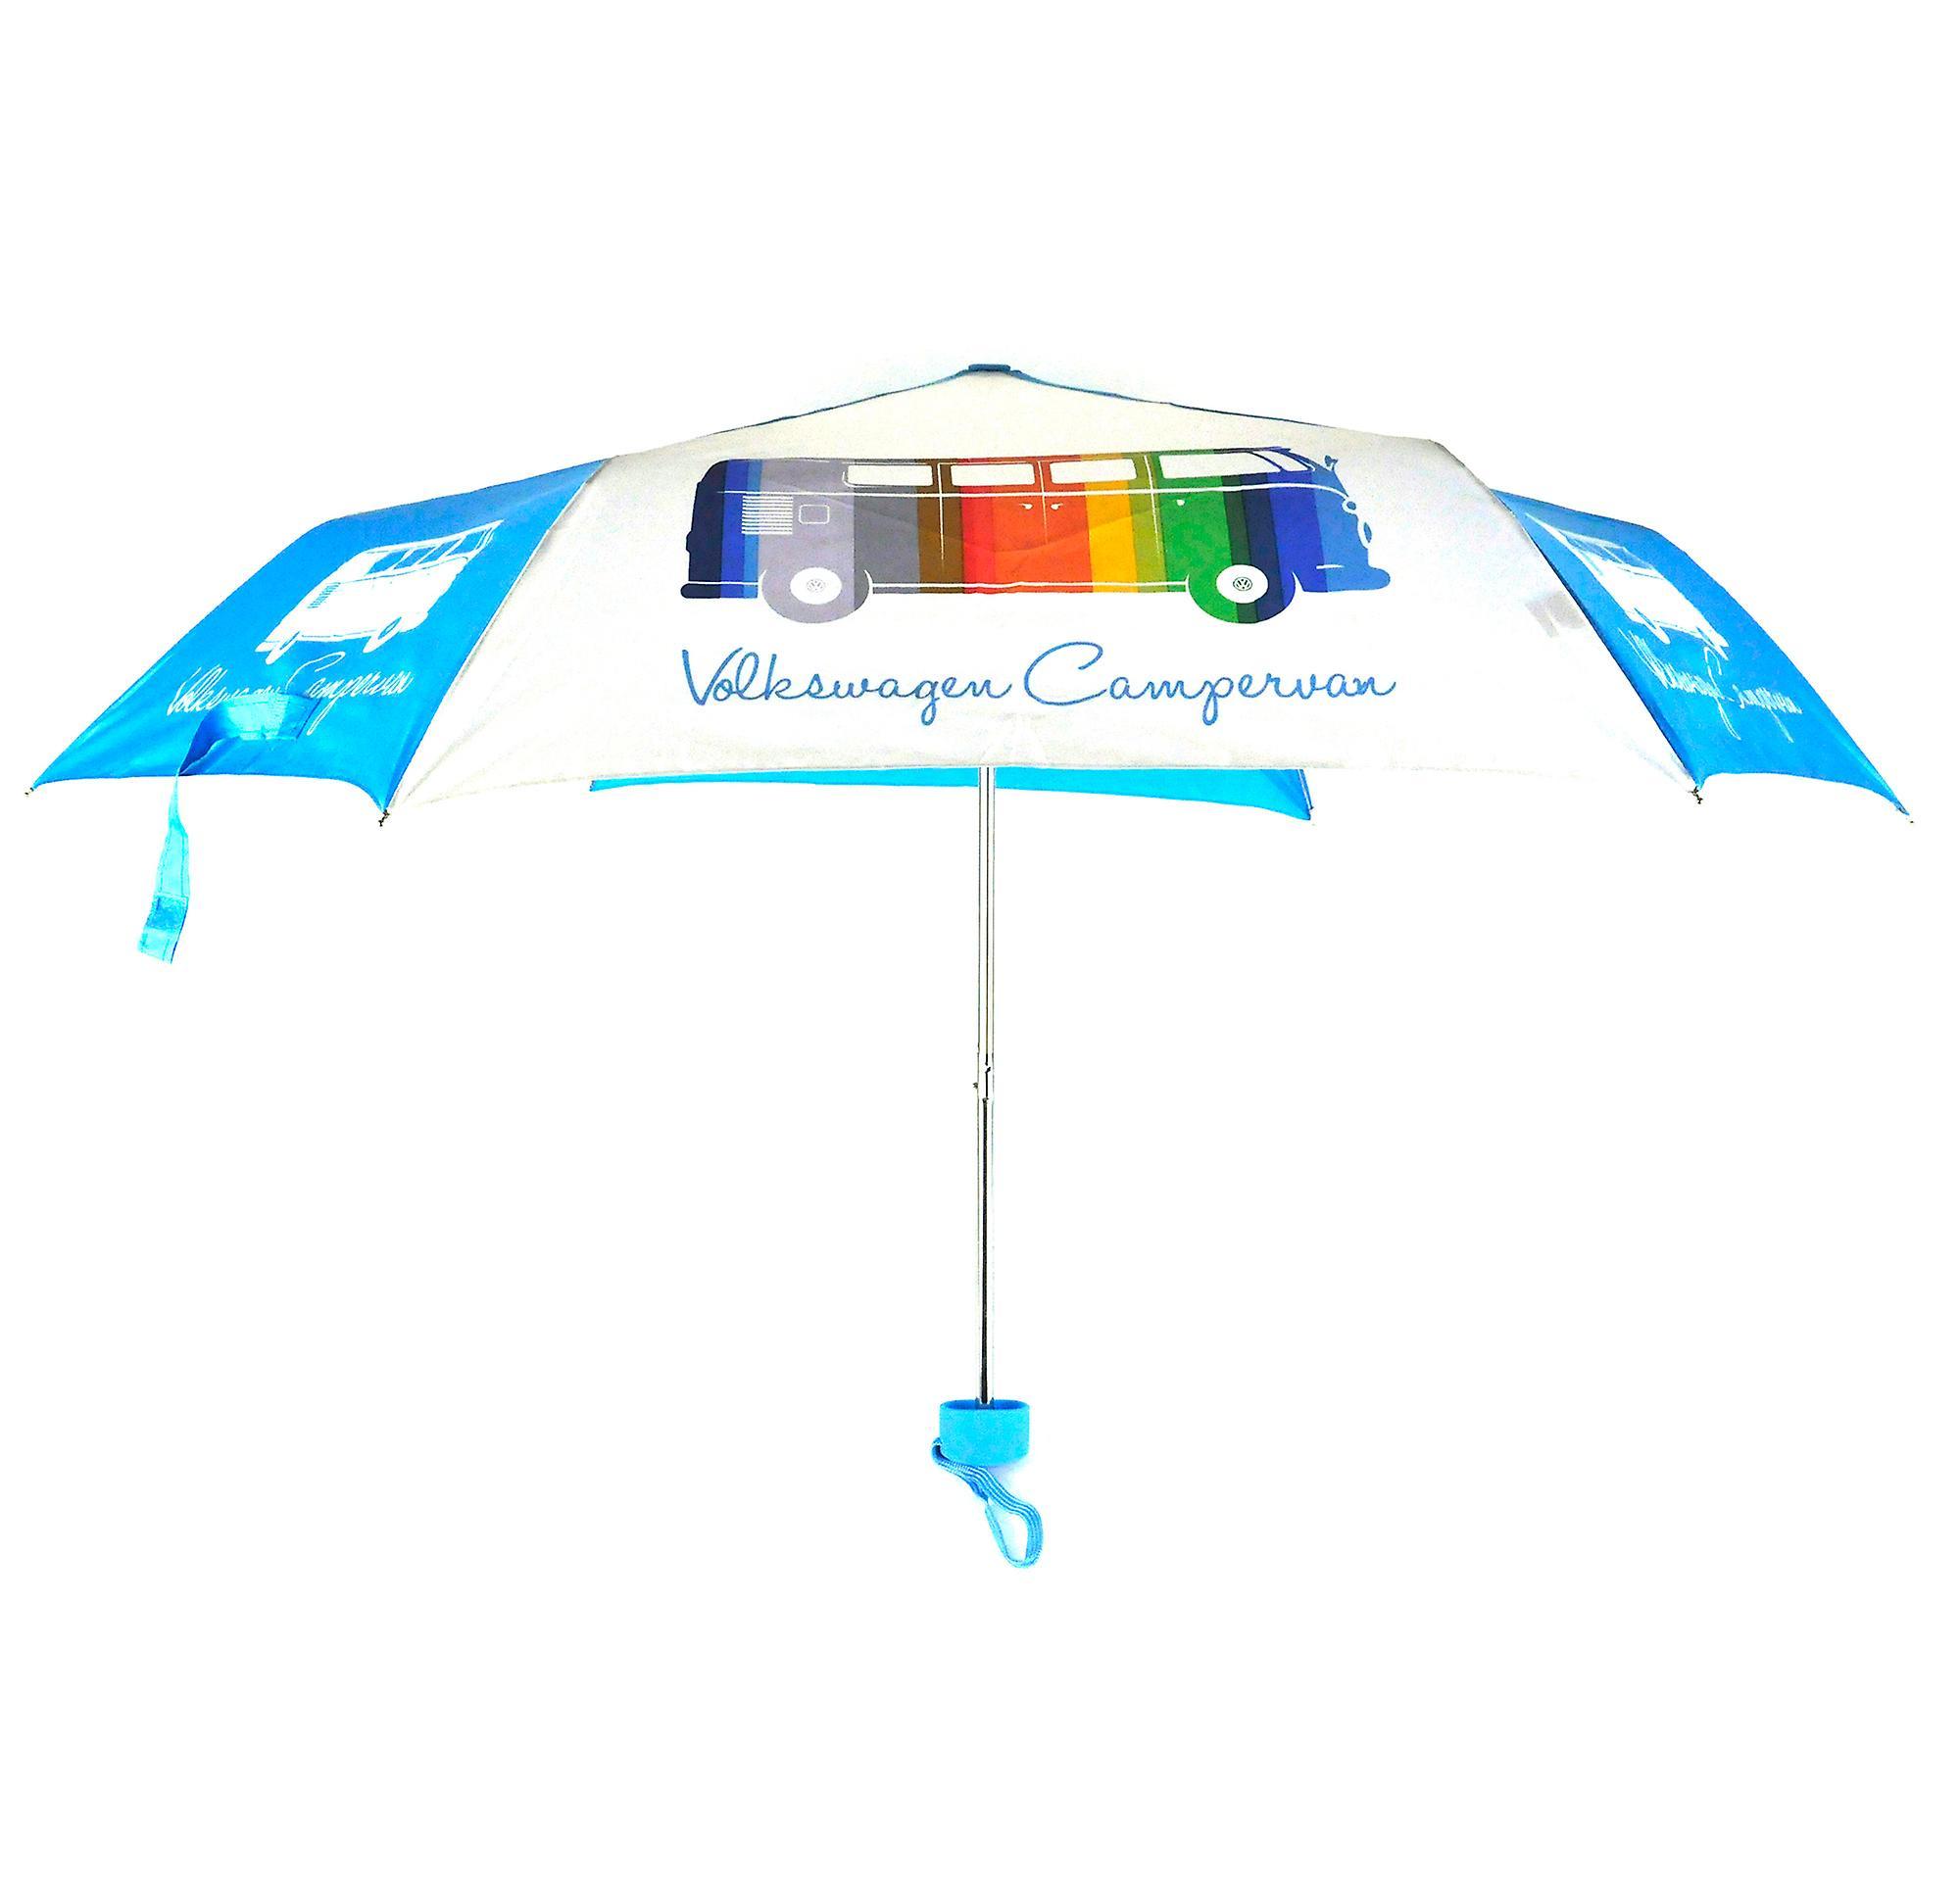 Official VW Camper Van Folding Travel Umbrella - Multi-Coloured Campervan